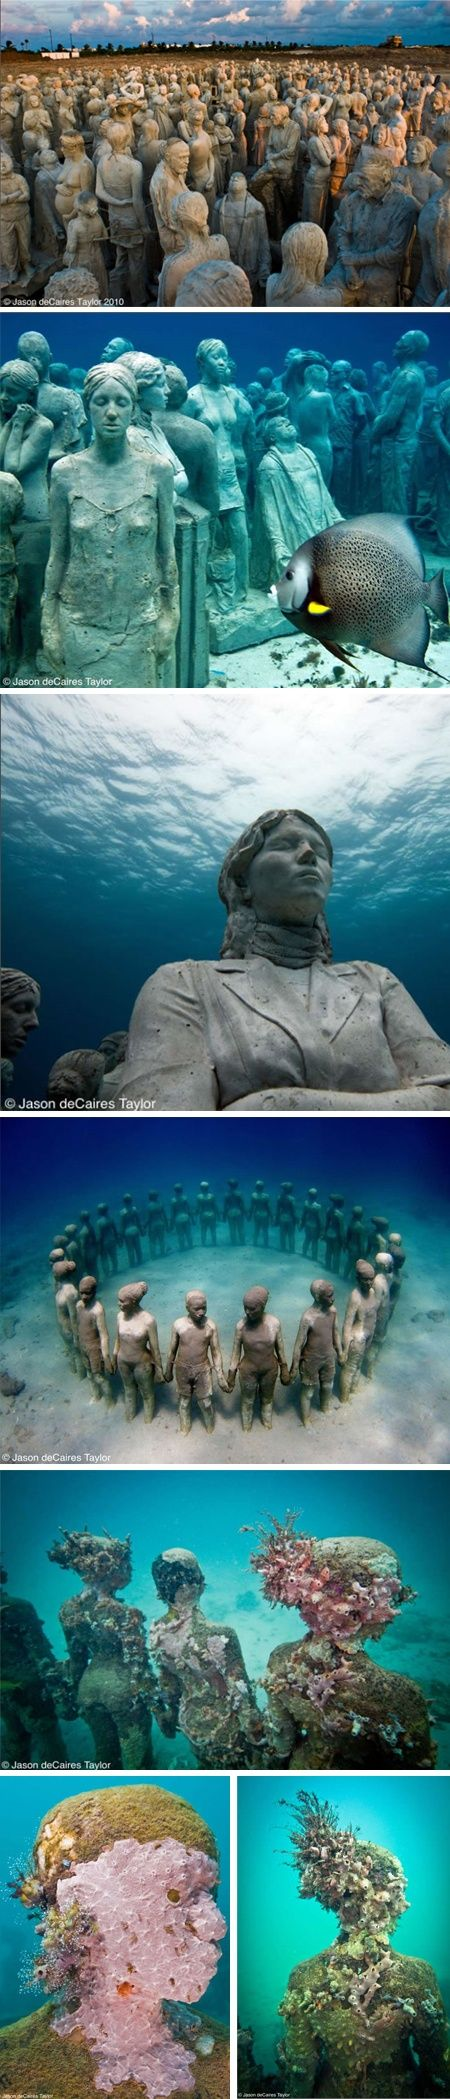 Underwater museum, Cancun.